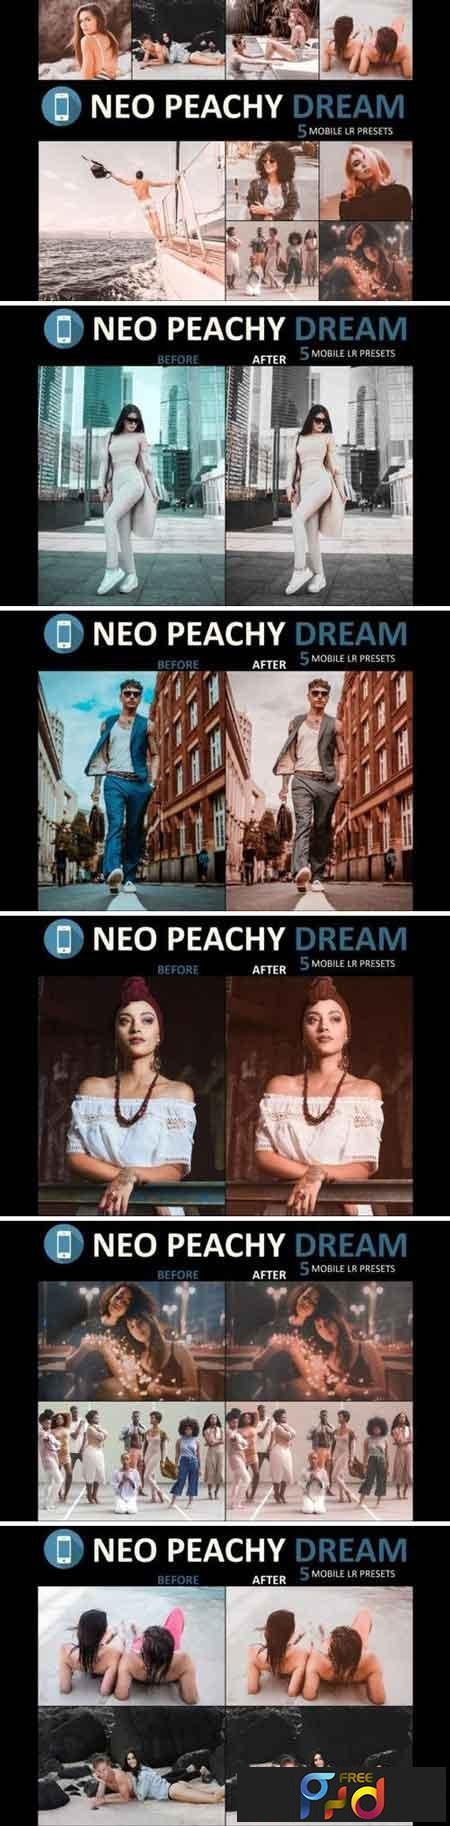 Neo Peachy Dream mobile lightroom presets 1